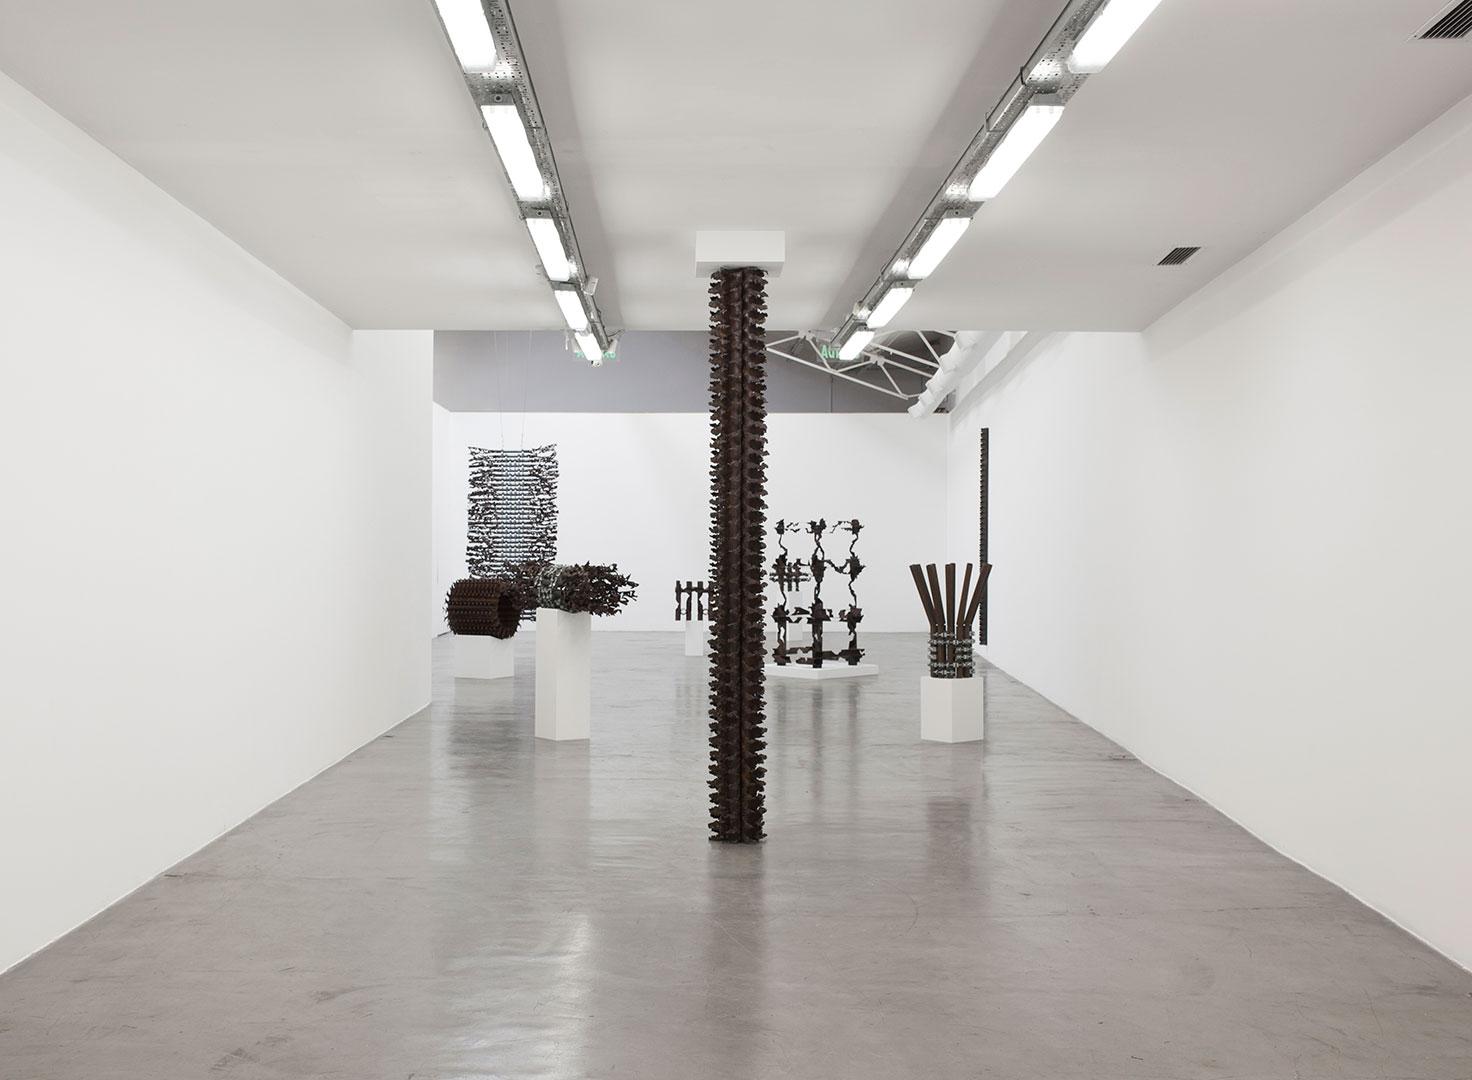 Puntal | 2018 | Iron pipes | 300 x 30 x 30 cm